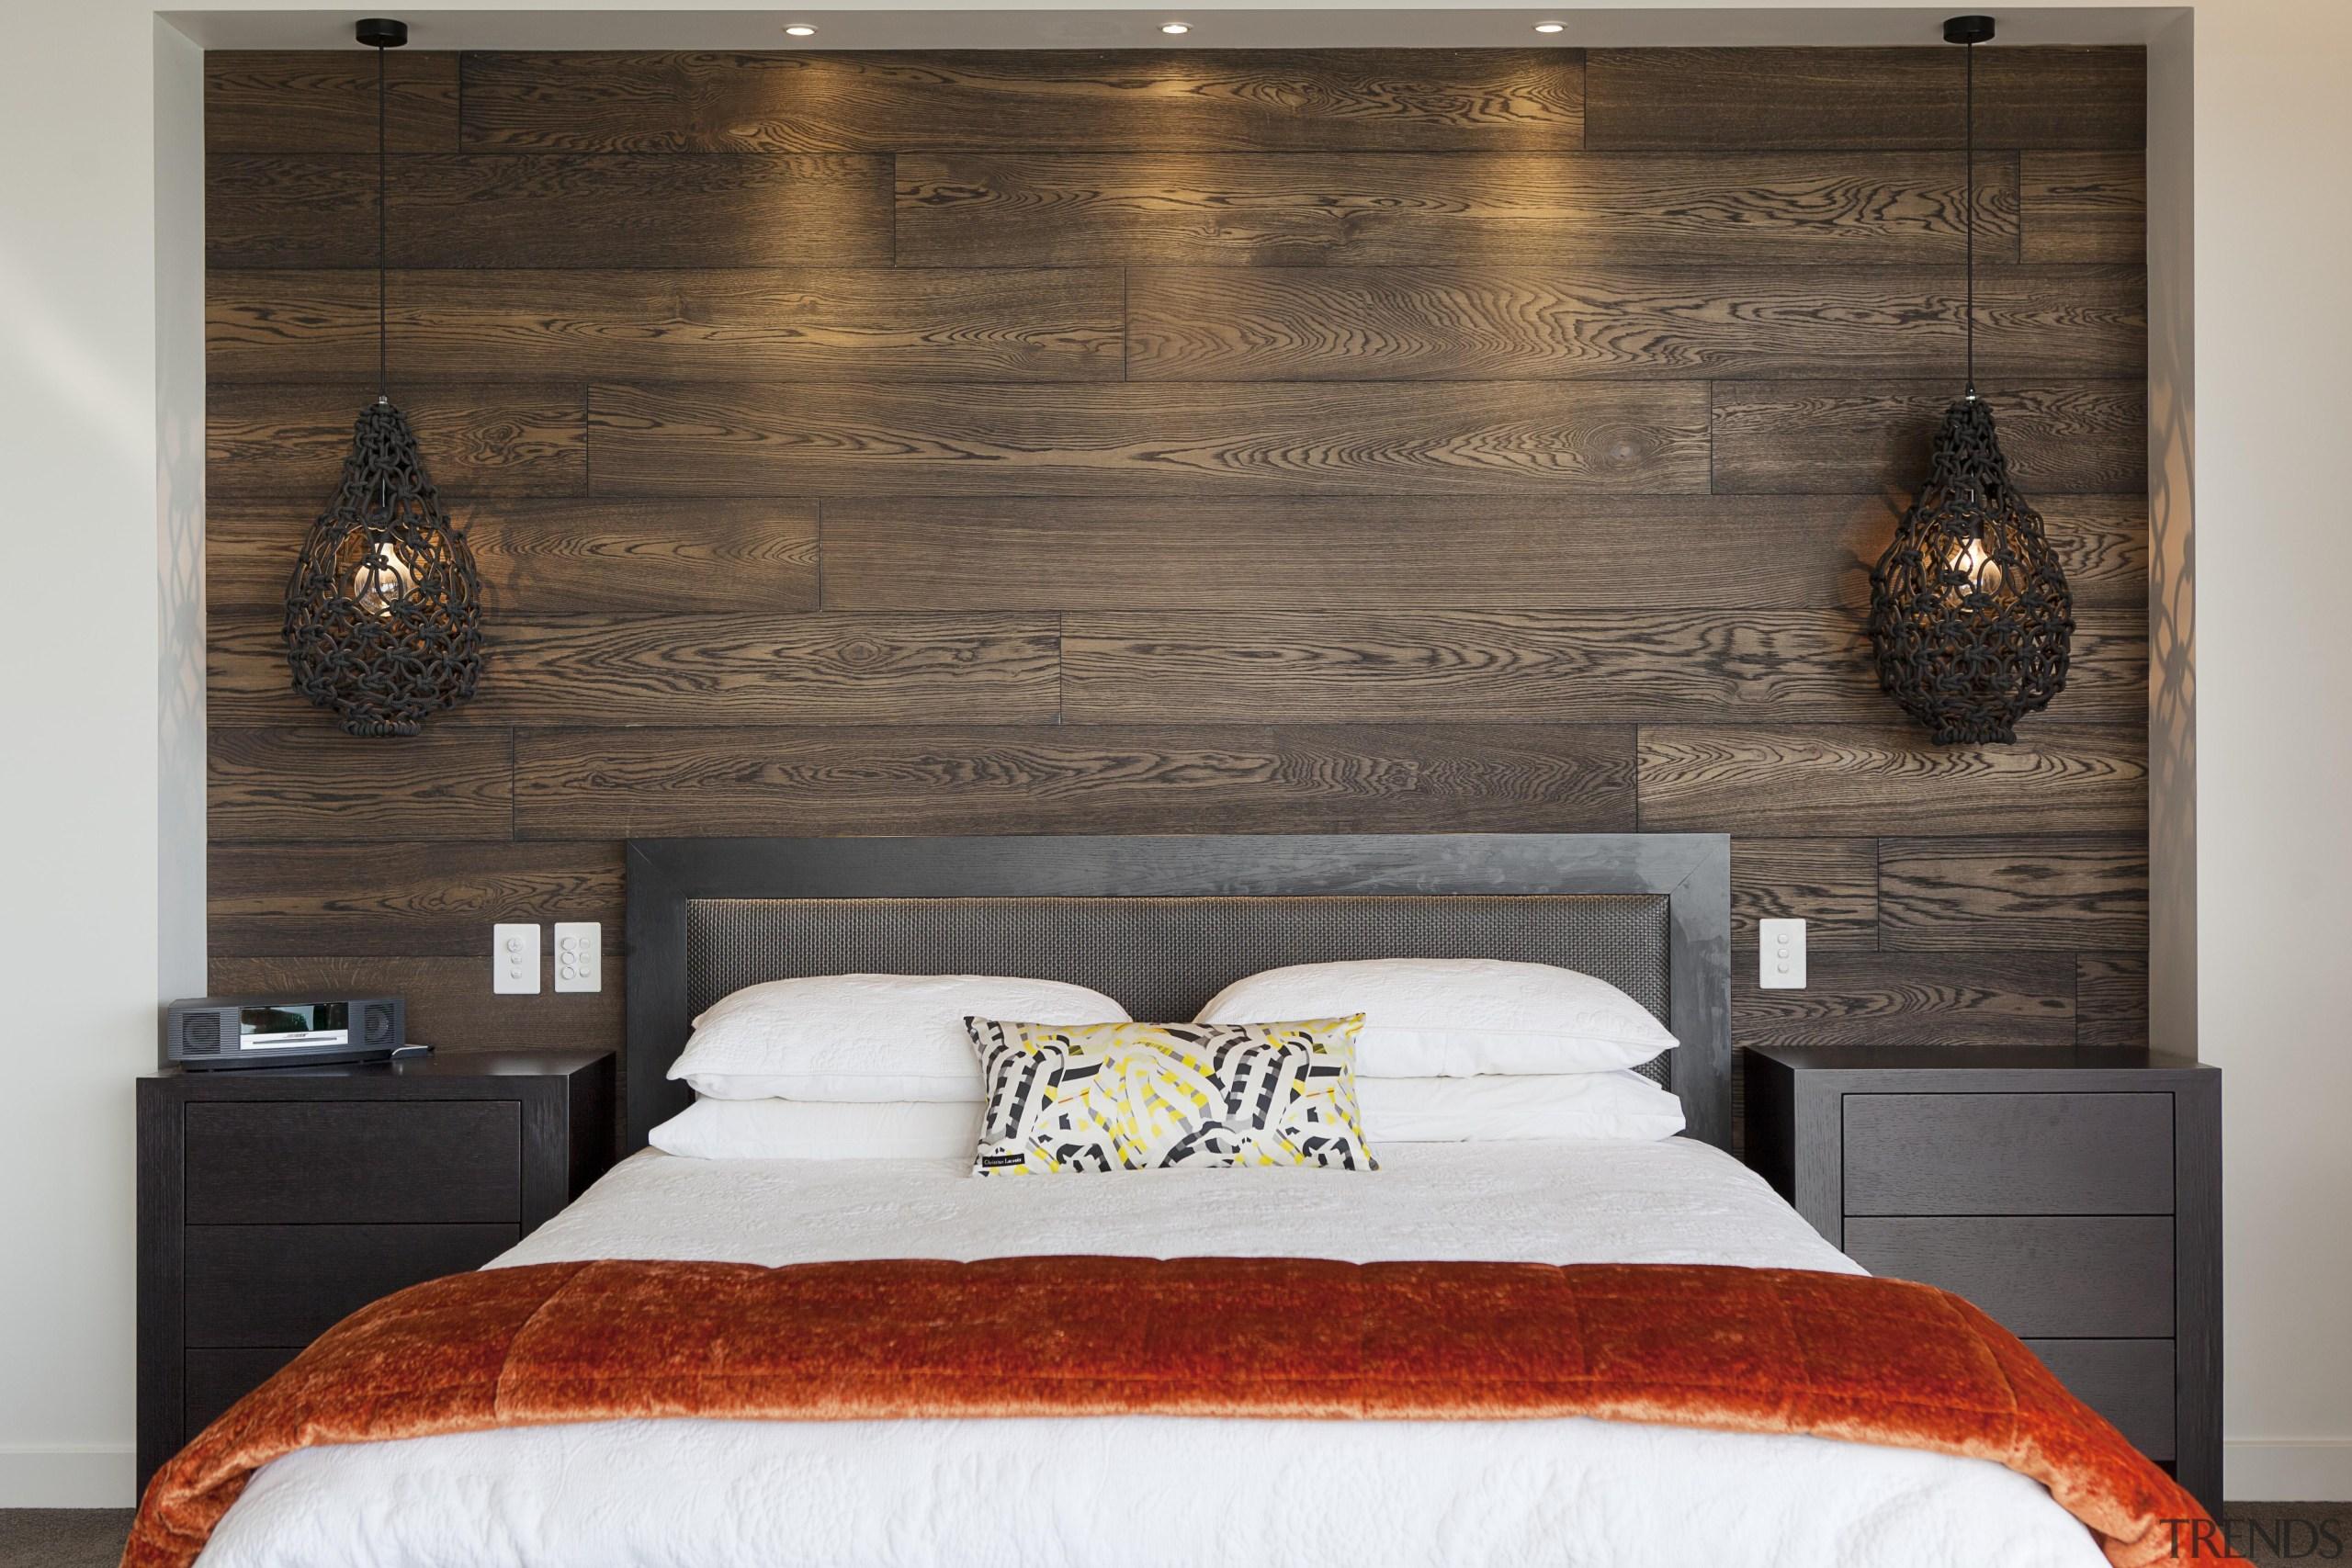 DFD Wood Floors is Creative Flooring brand for bed, bed frame, bed sheet, bedroom, ceiling, floor, furniture, home, interior design, room, suite, wall, wood, gray, black